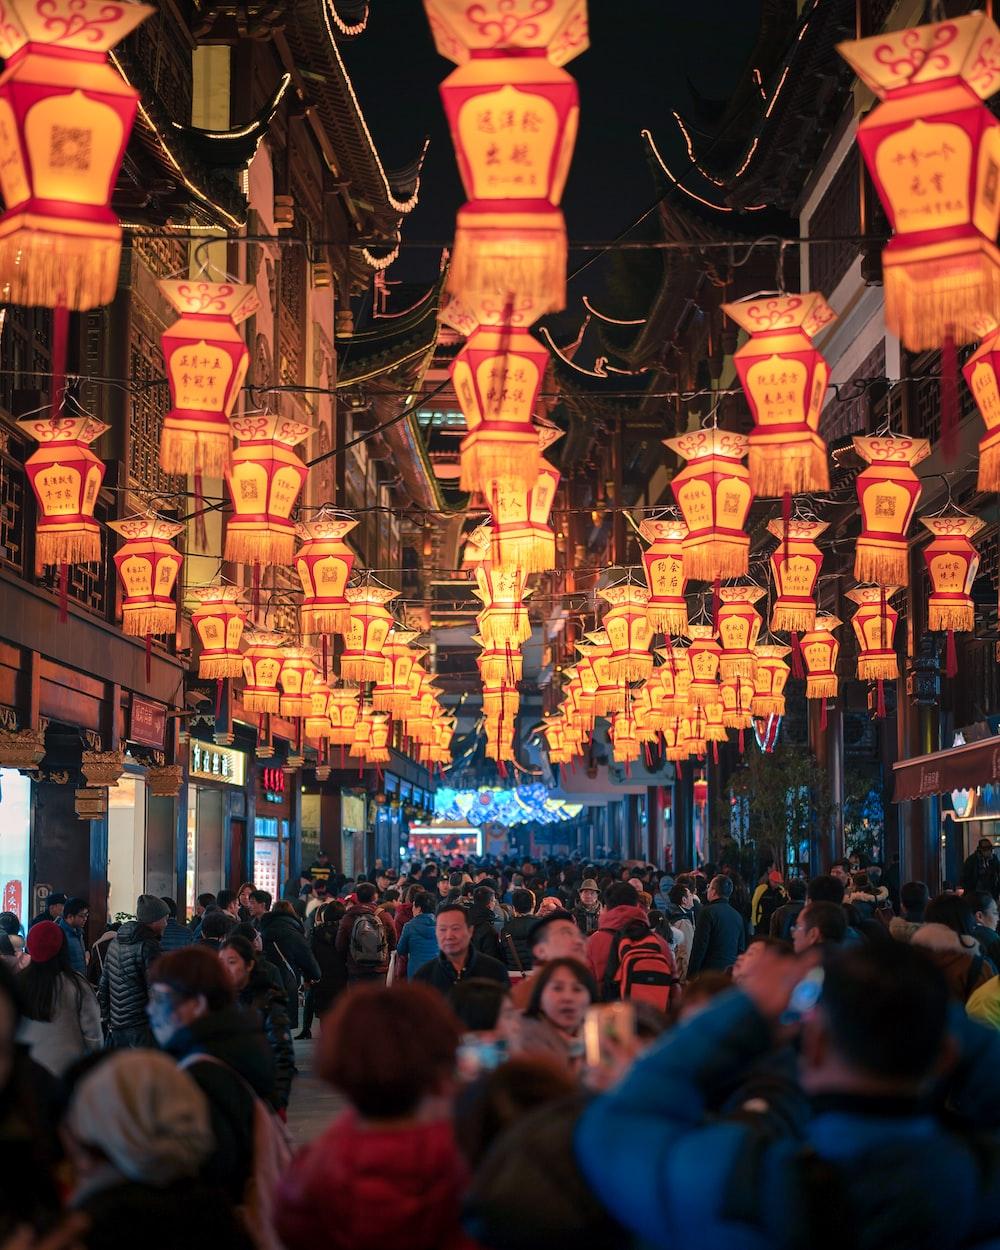 people walking between establishments with lanterns above